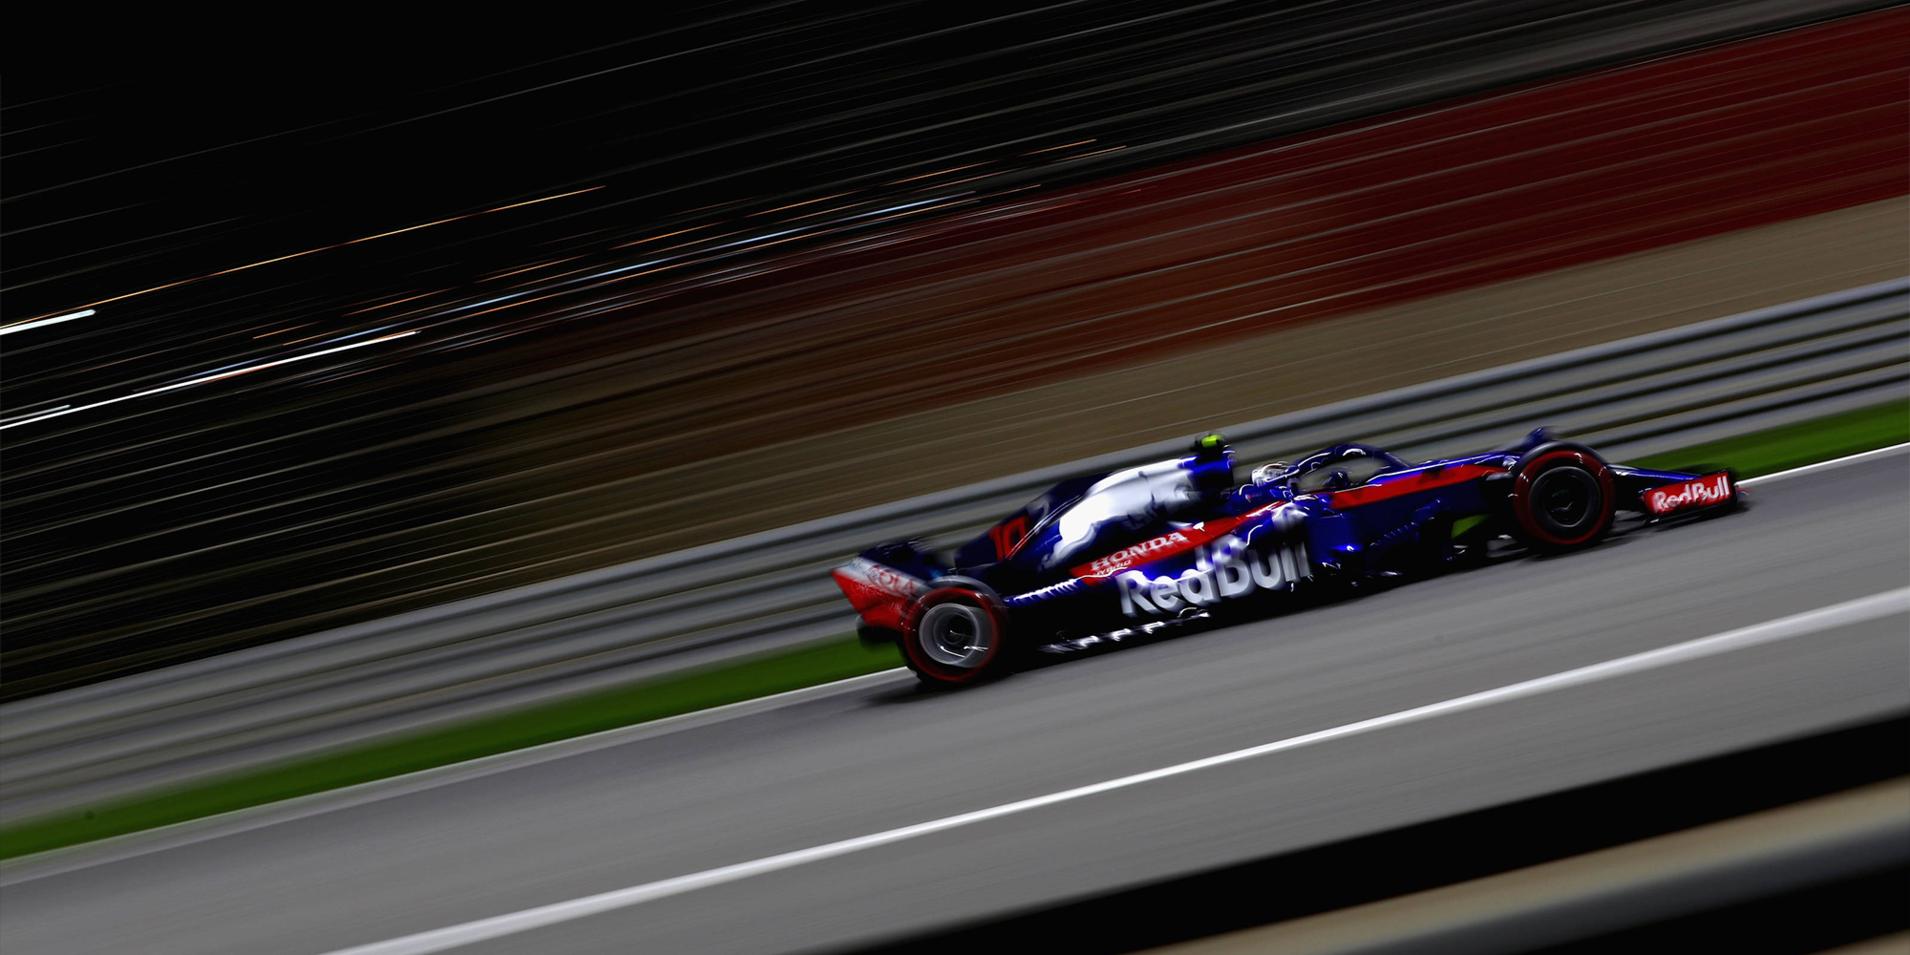 Bahrain GP – Qualifying